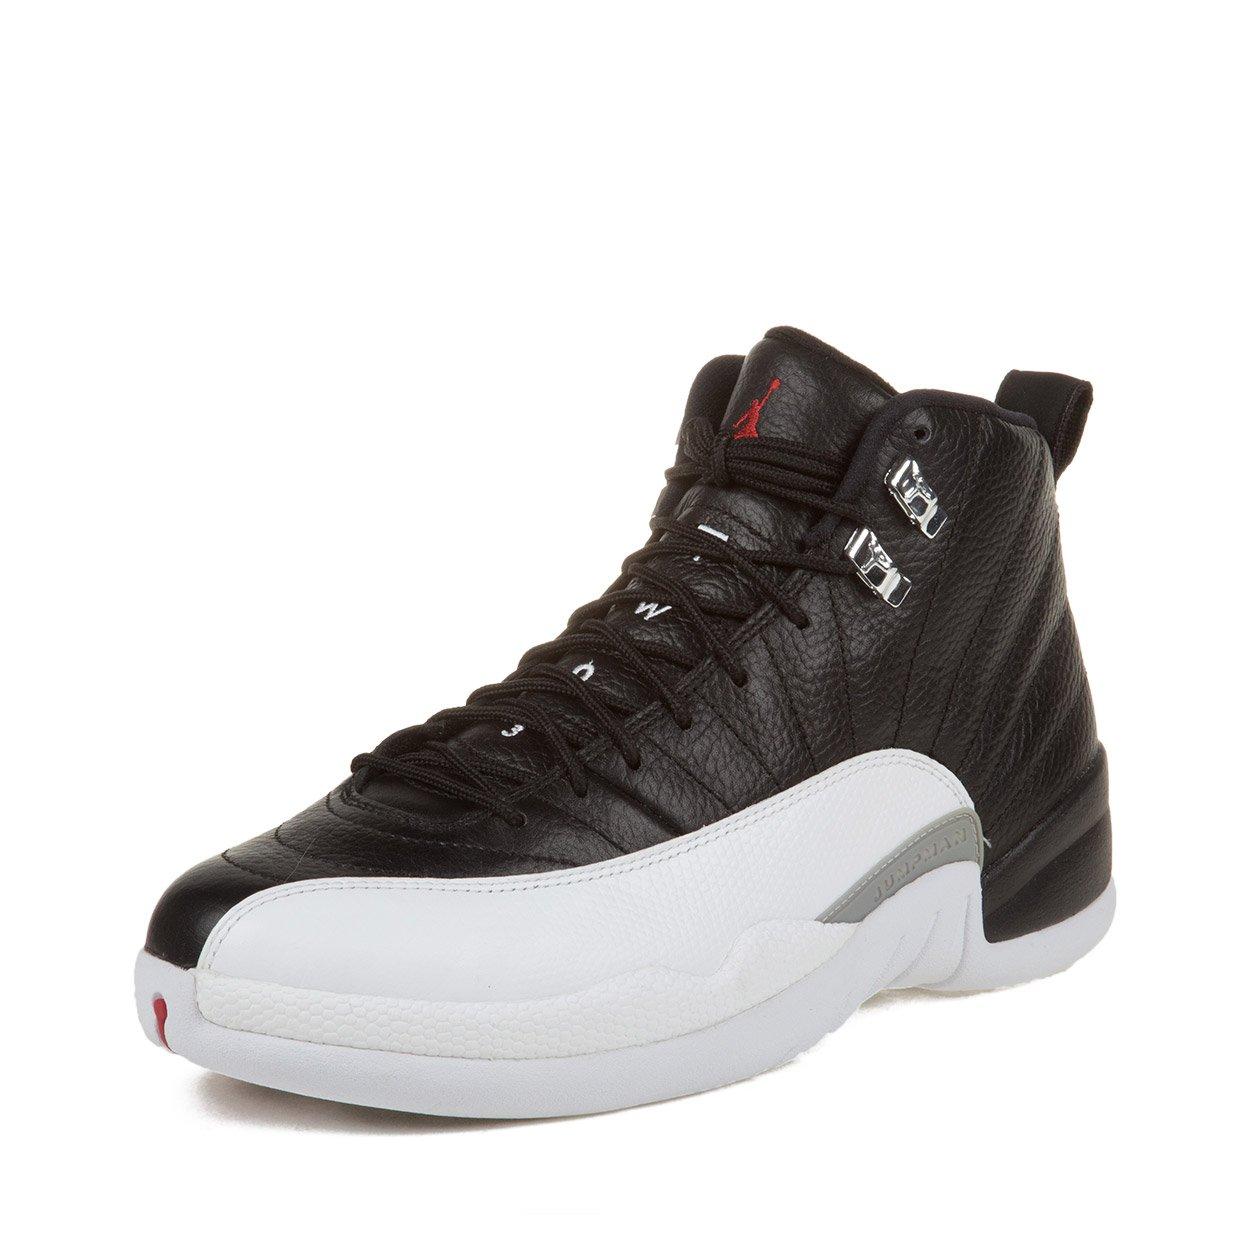 Nike 12 RETRO 'PLAYOFF 2012 RELEASE' - 130690-001